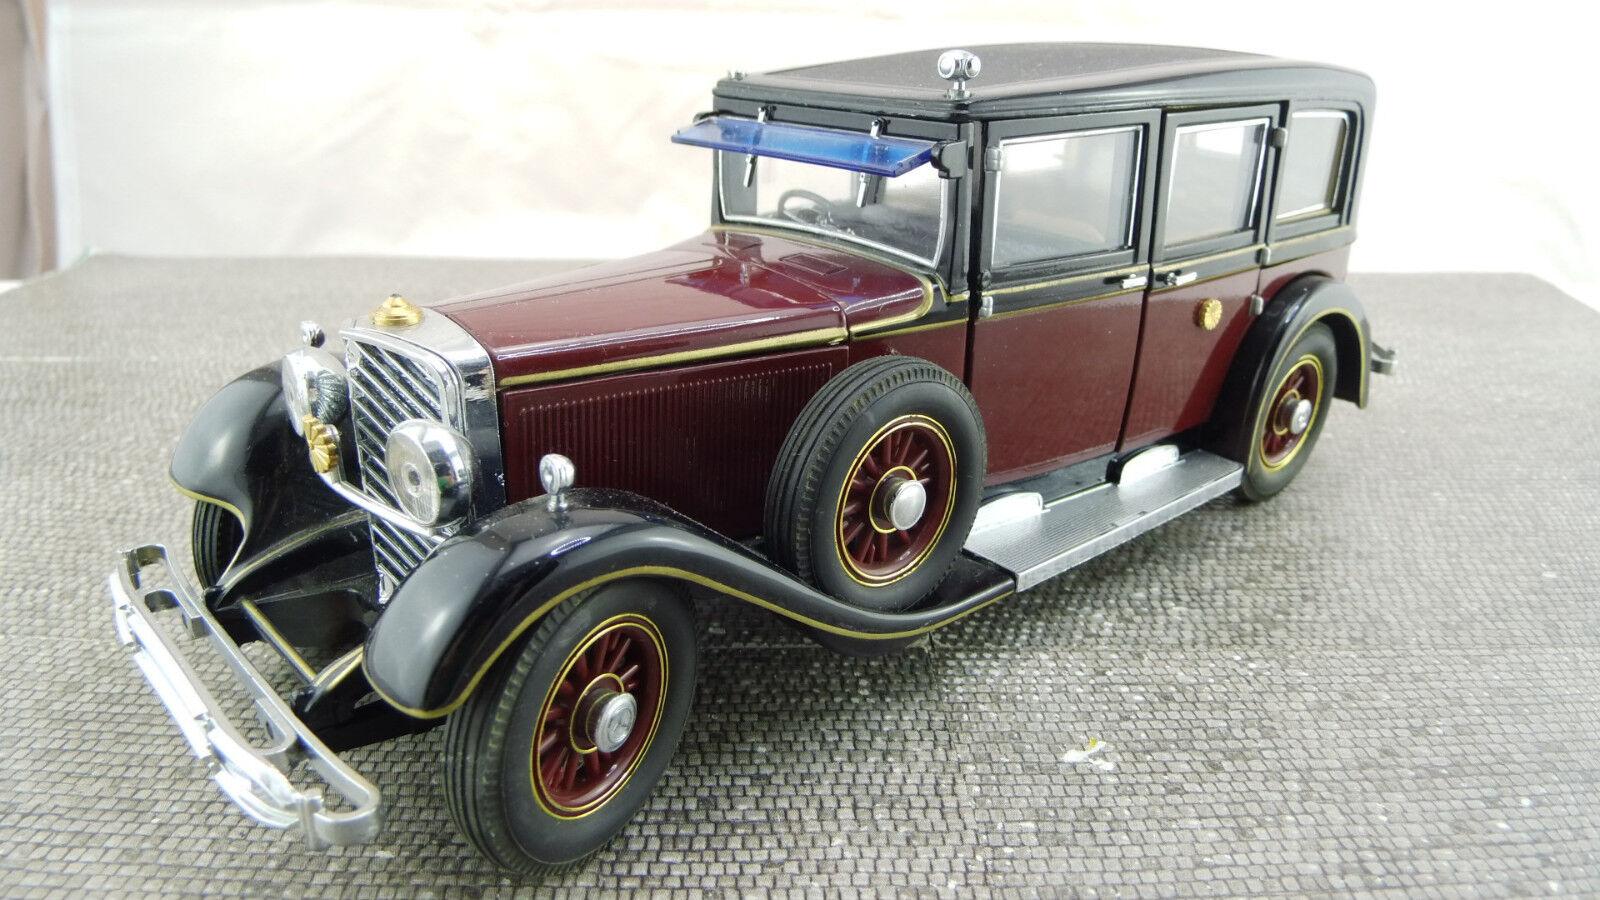 MINICHAMPS 1 24 1935 Mercedes Benz 770 a672 bon état